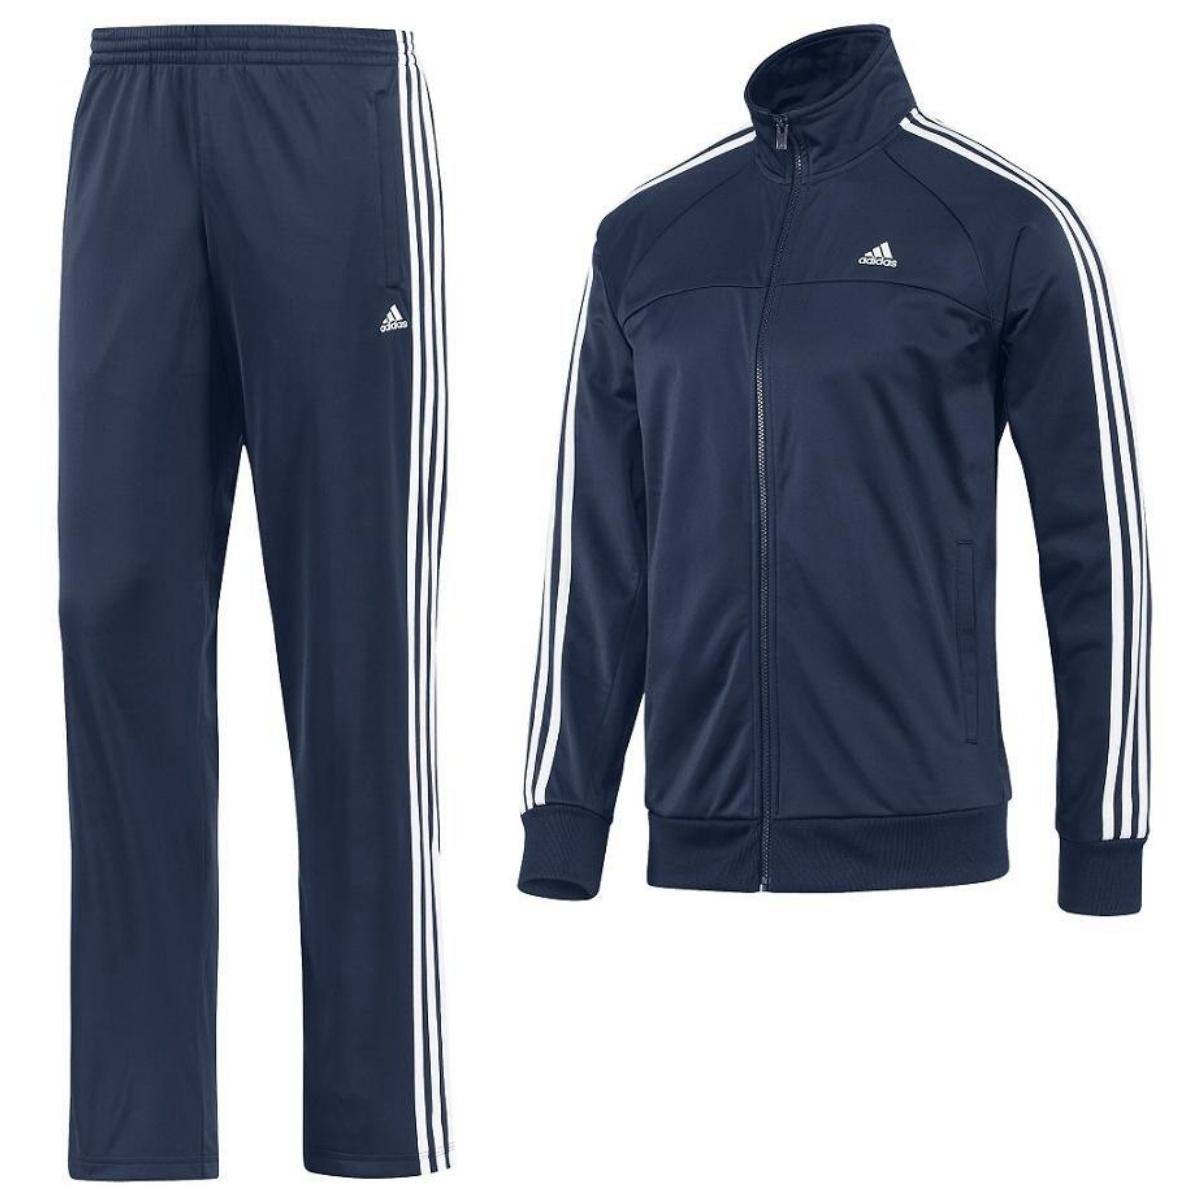 adidas essentials 3 stripes track suit herren trainingsanzug jogginganzug ebay. Black Bedroom Furniture Sets. Home Design Ideas